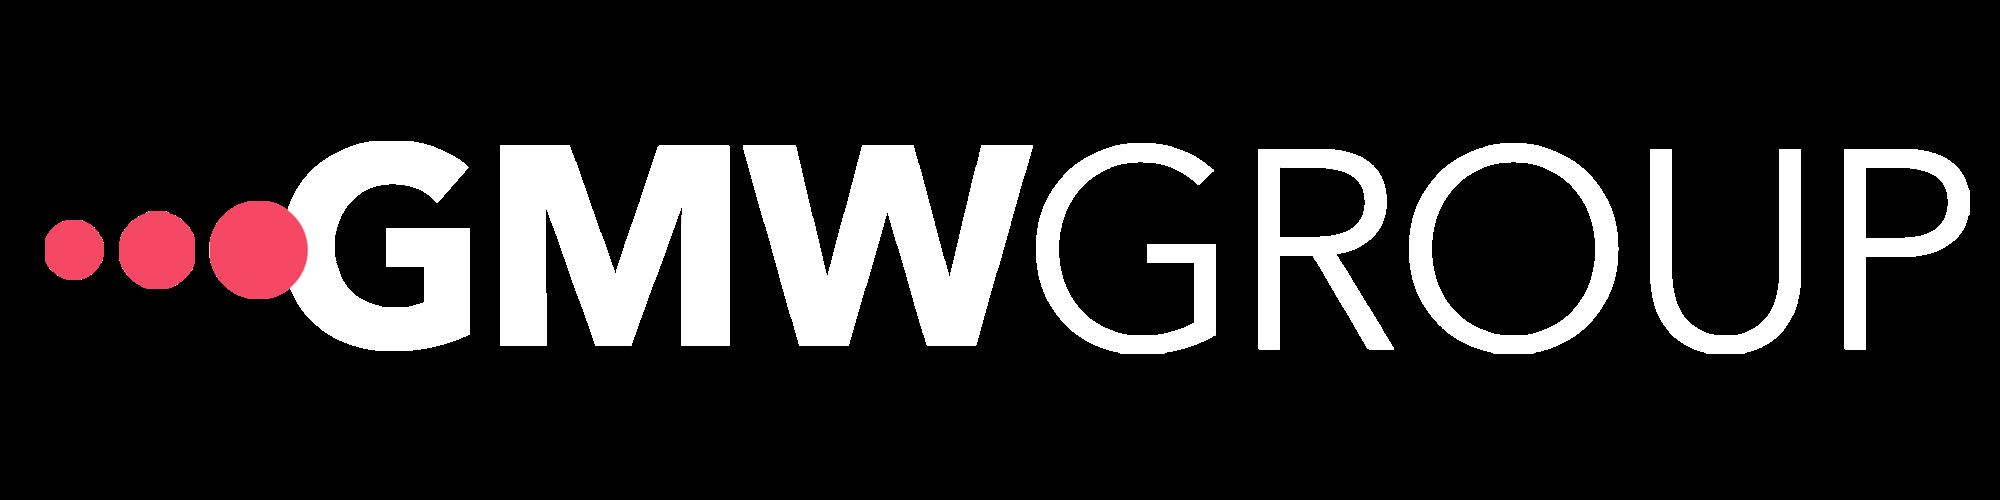 gmwgroup.de